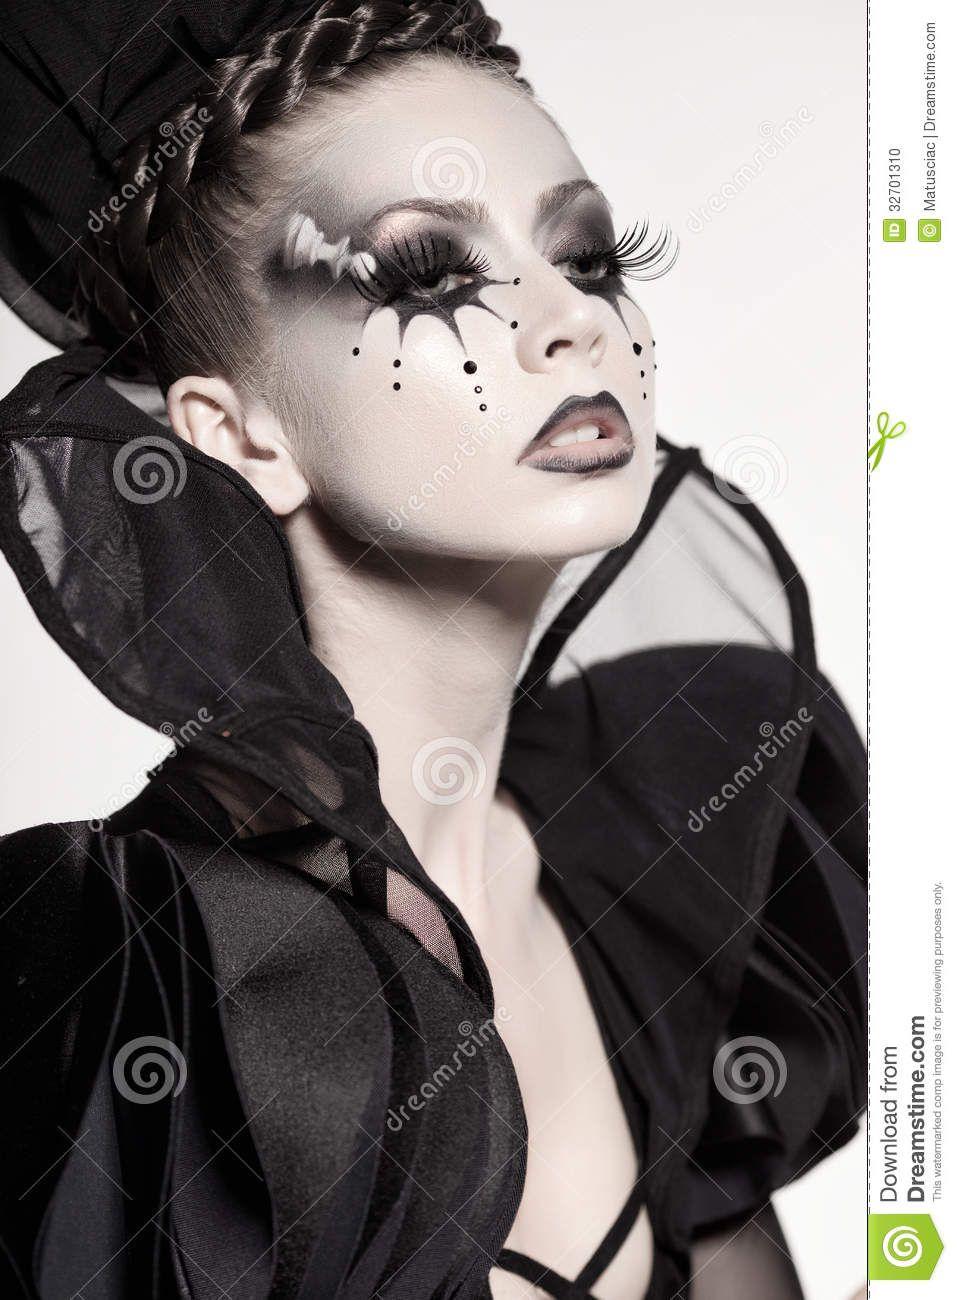 Maquillaje fantasia buscar con google maquillaje pinterest